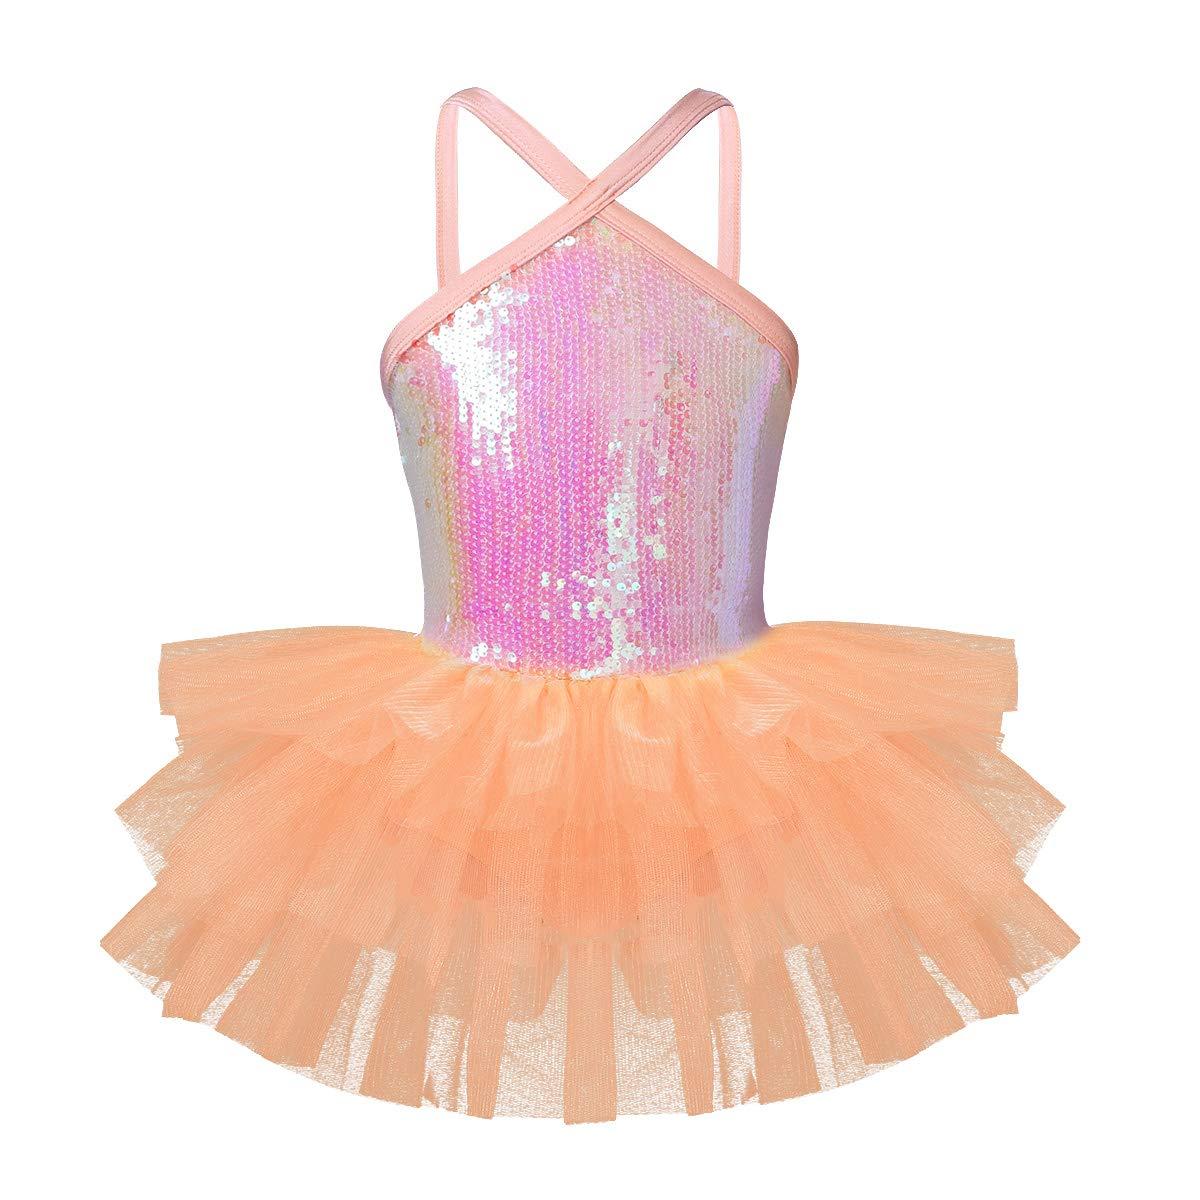 Cutout orange FEESHOW Girls' Sequined Camisole Leotard Dress Ballet Tutu Skirt Dance Costumes